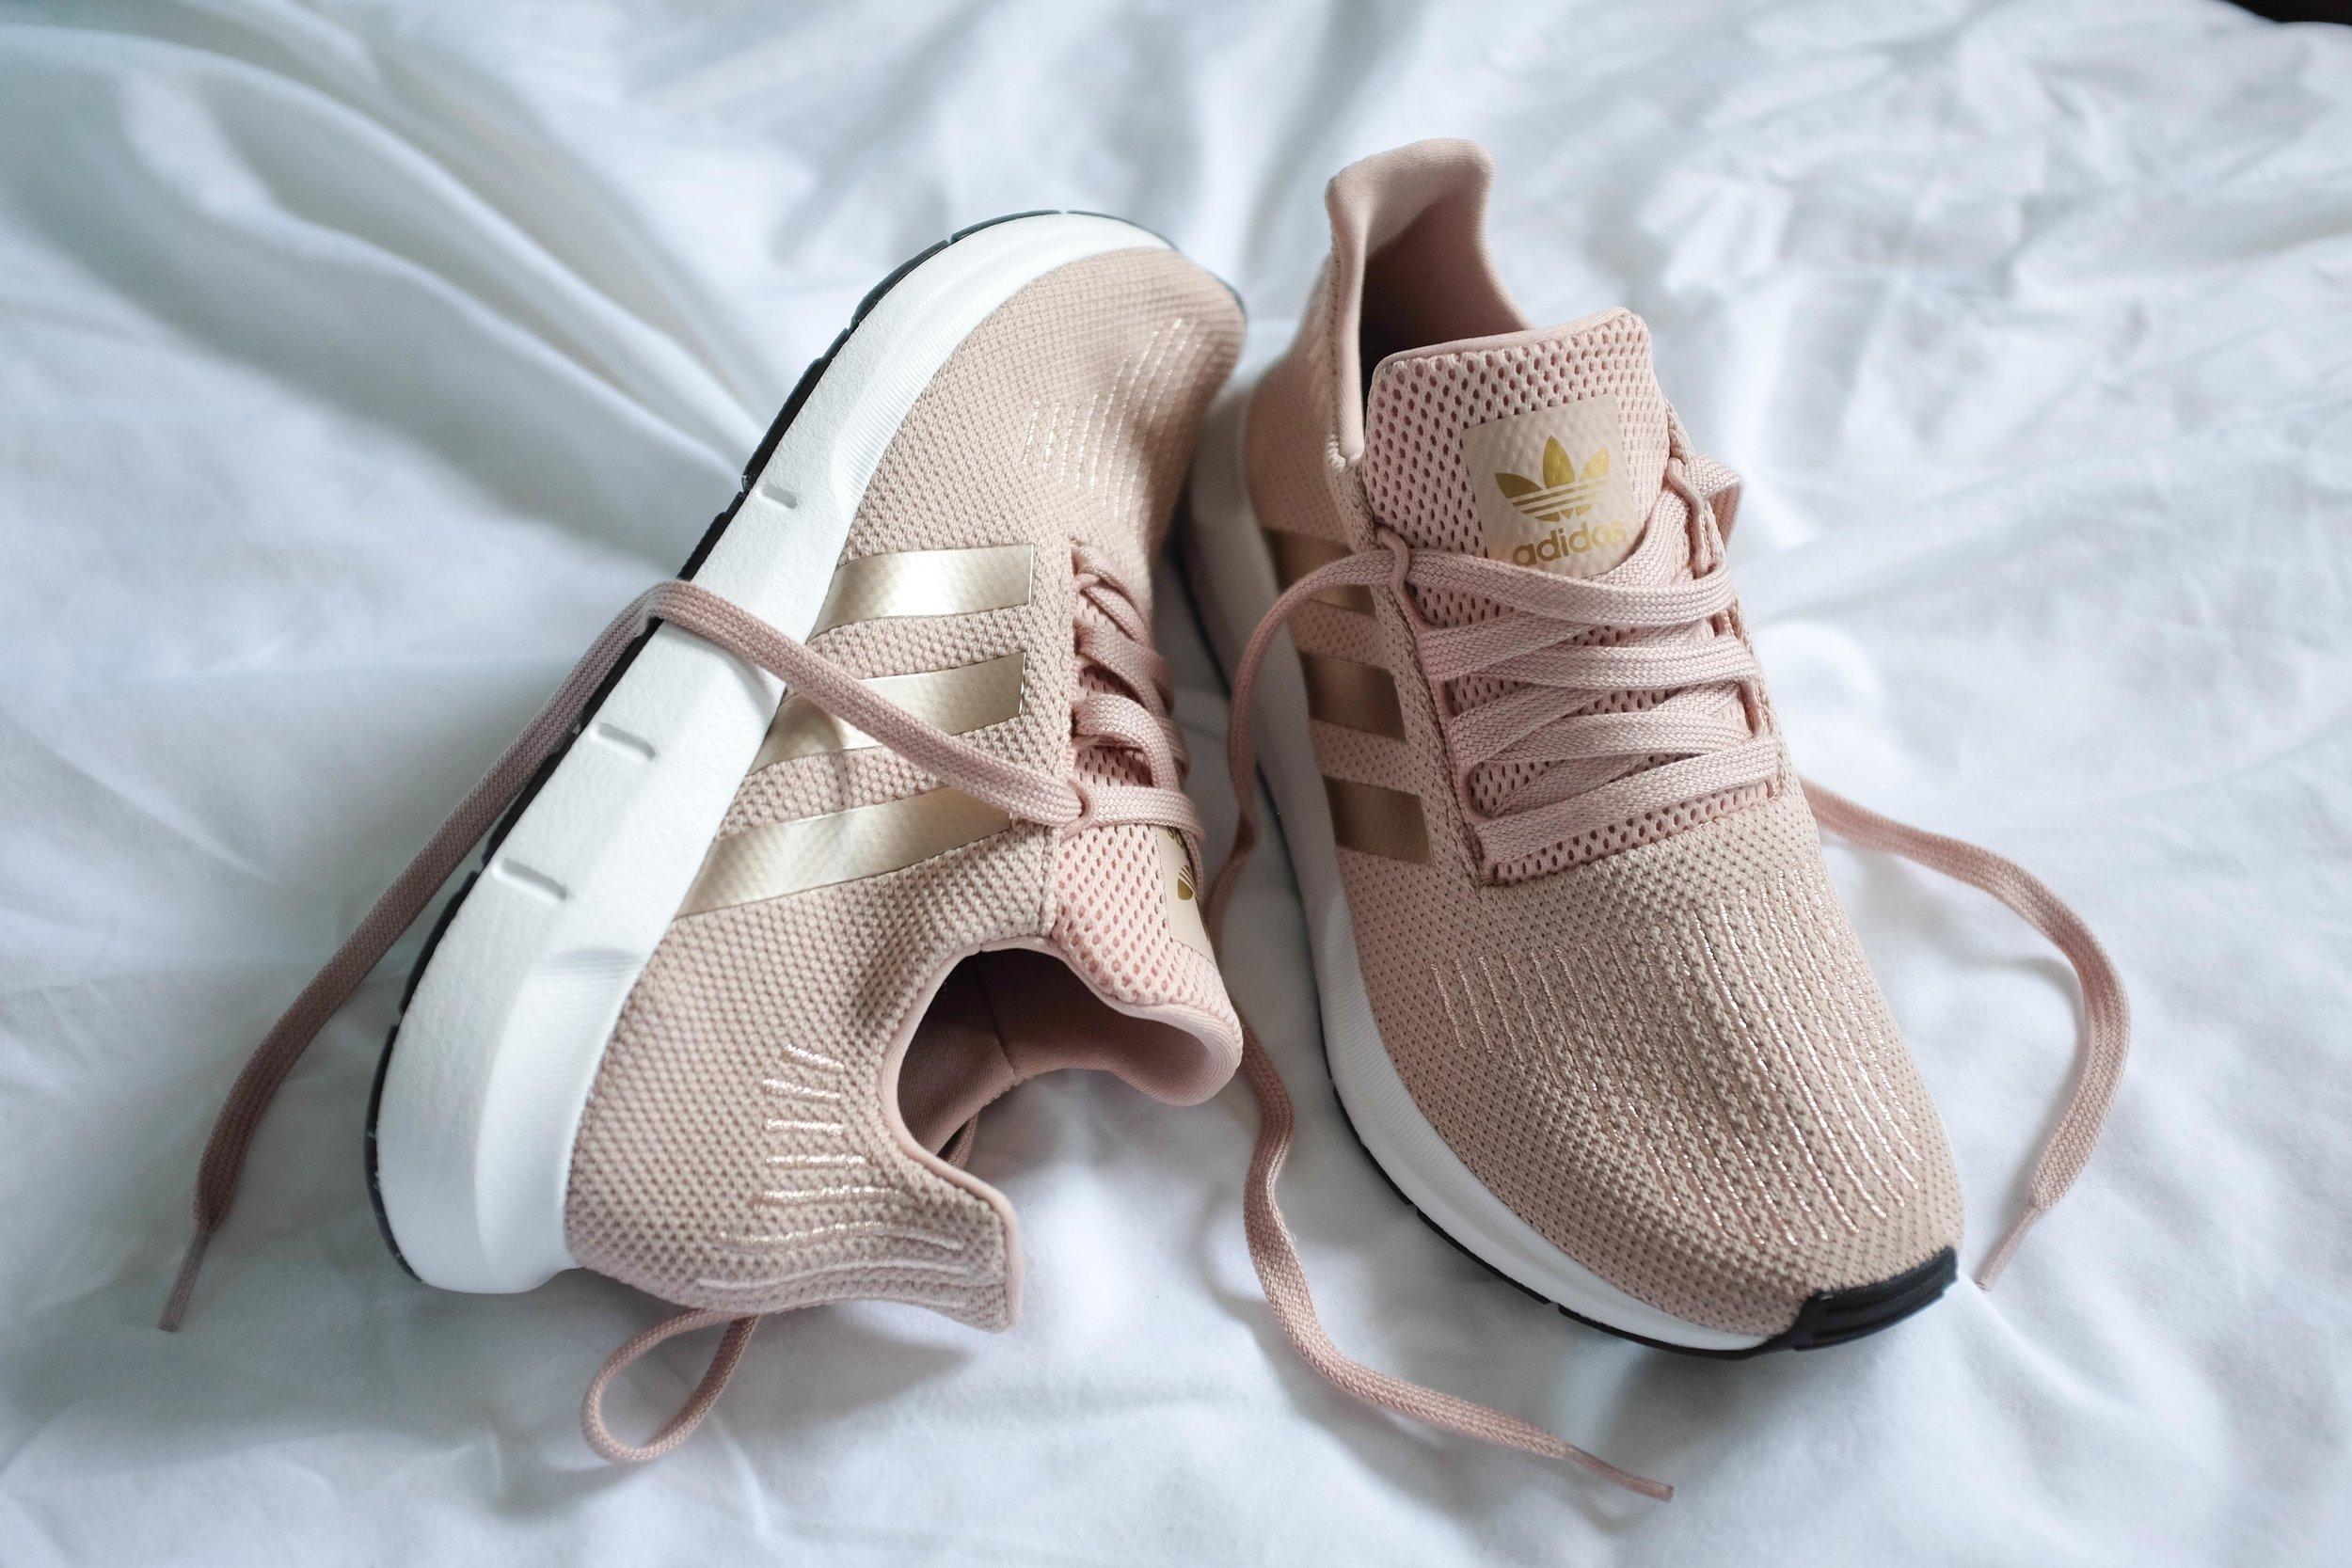 Adidas Originals Swift Run in Dust